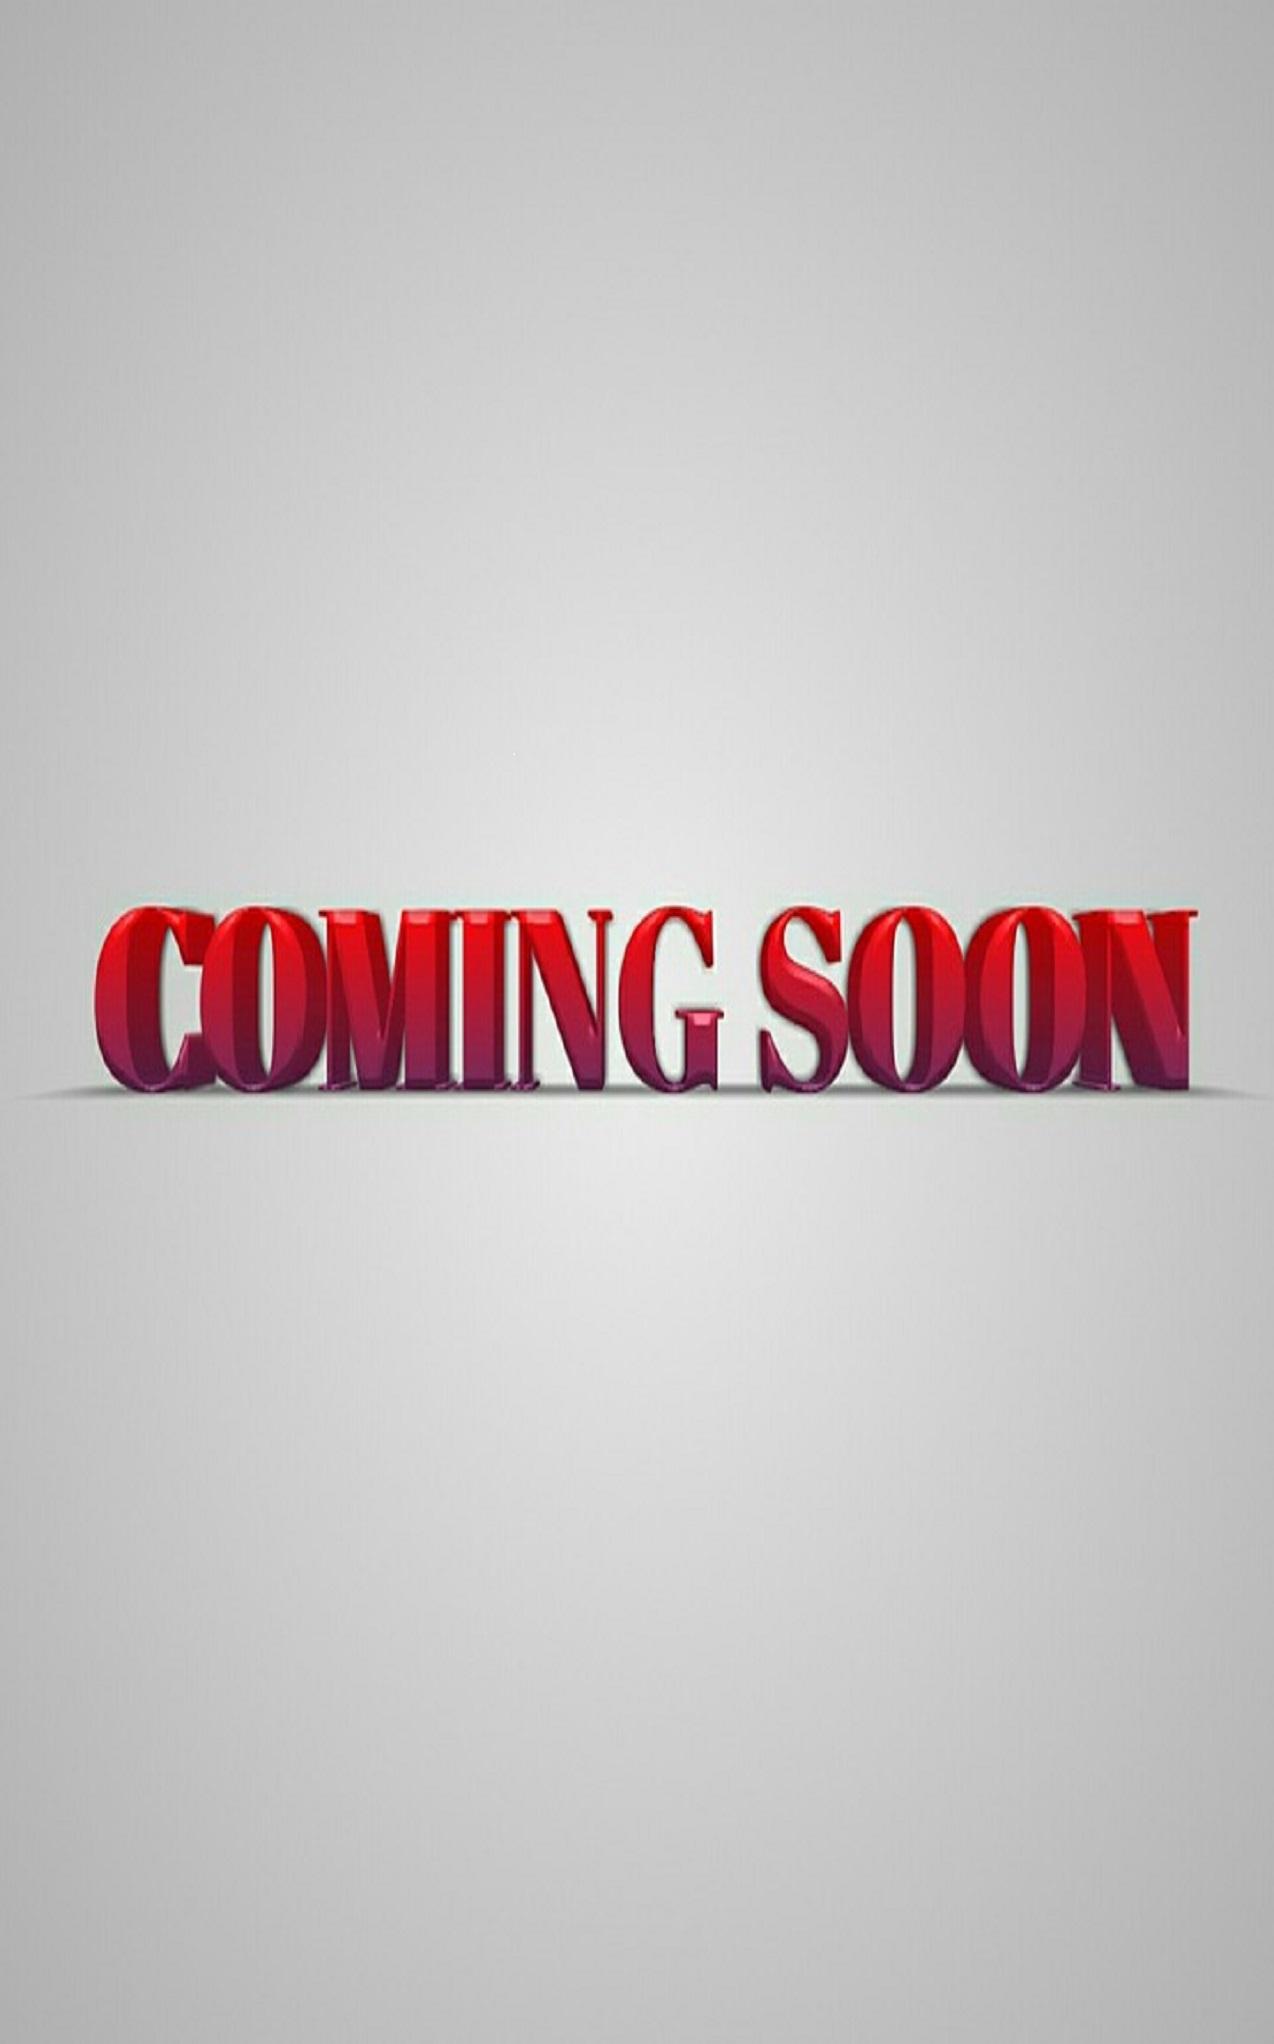 coming-soon-1571603_960_720